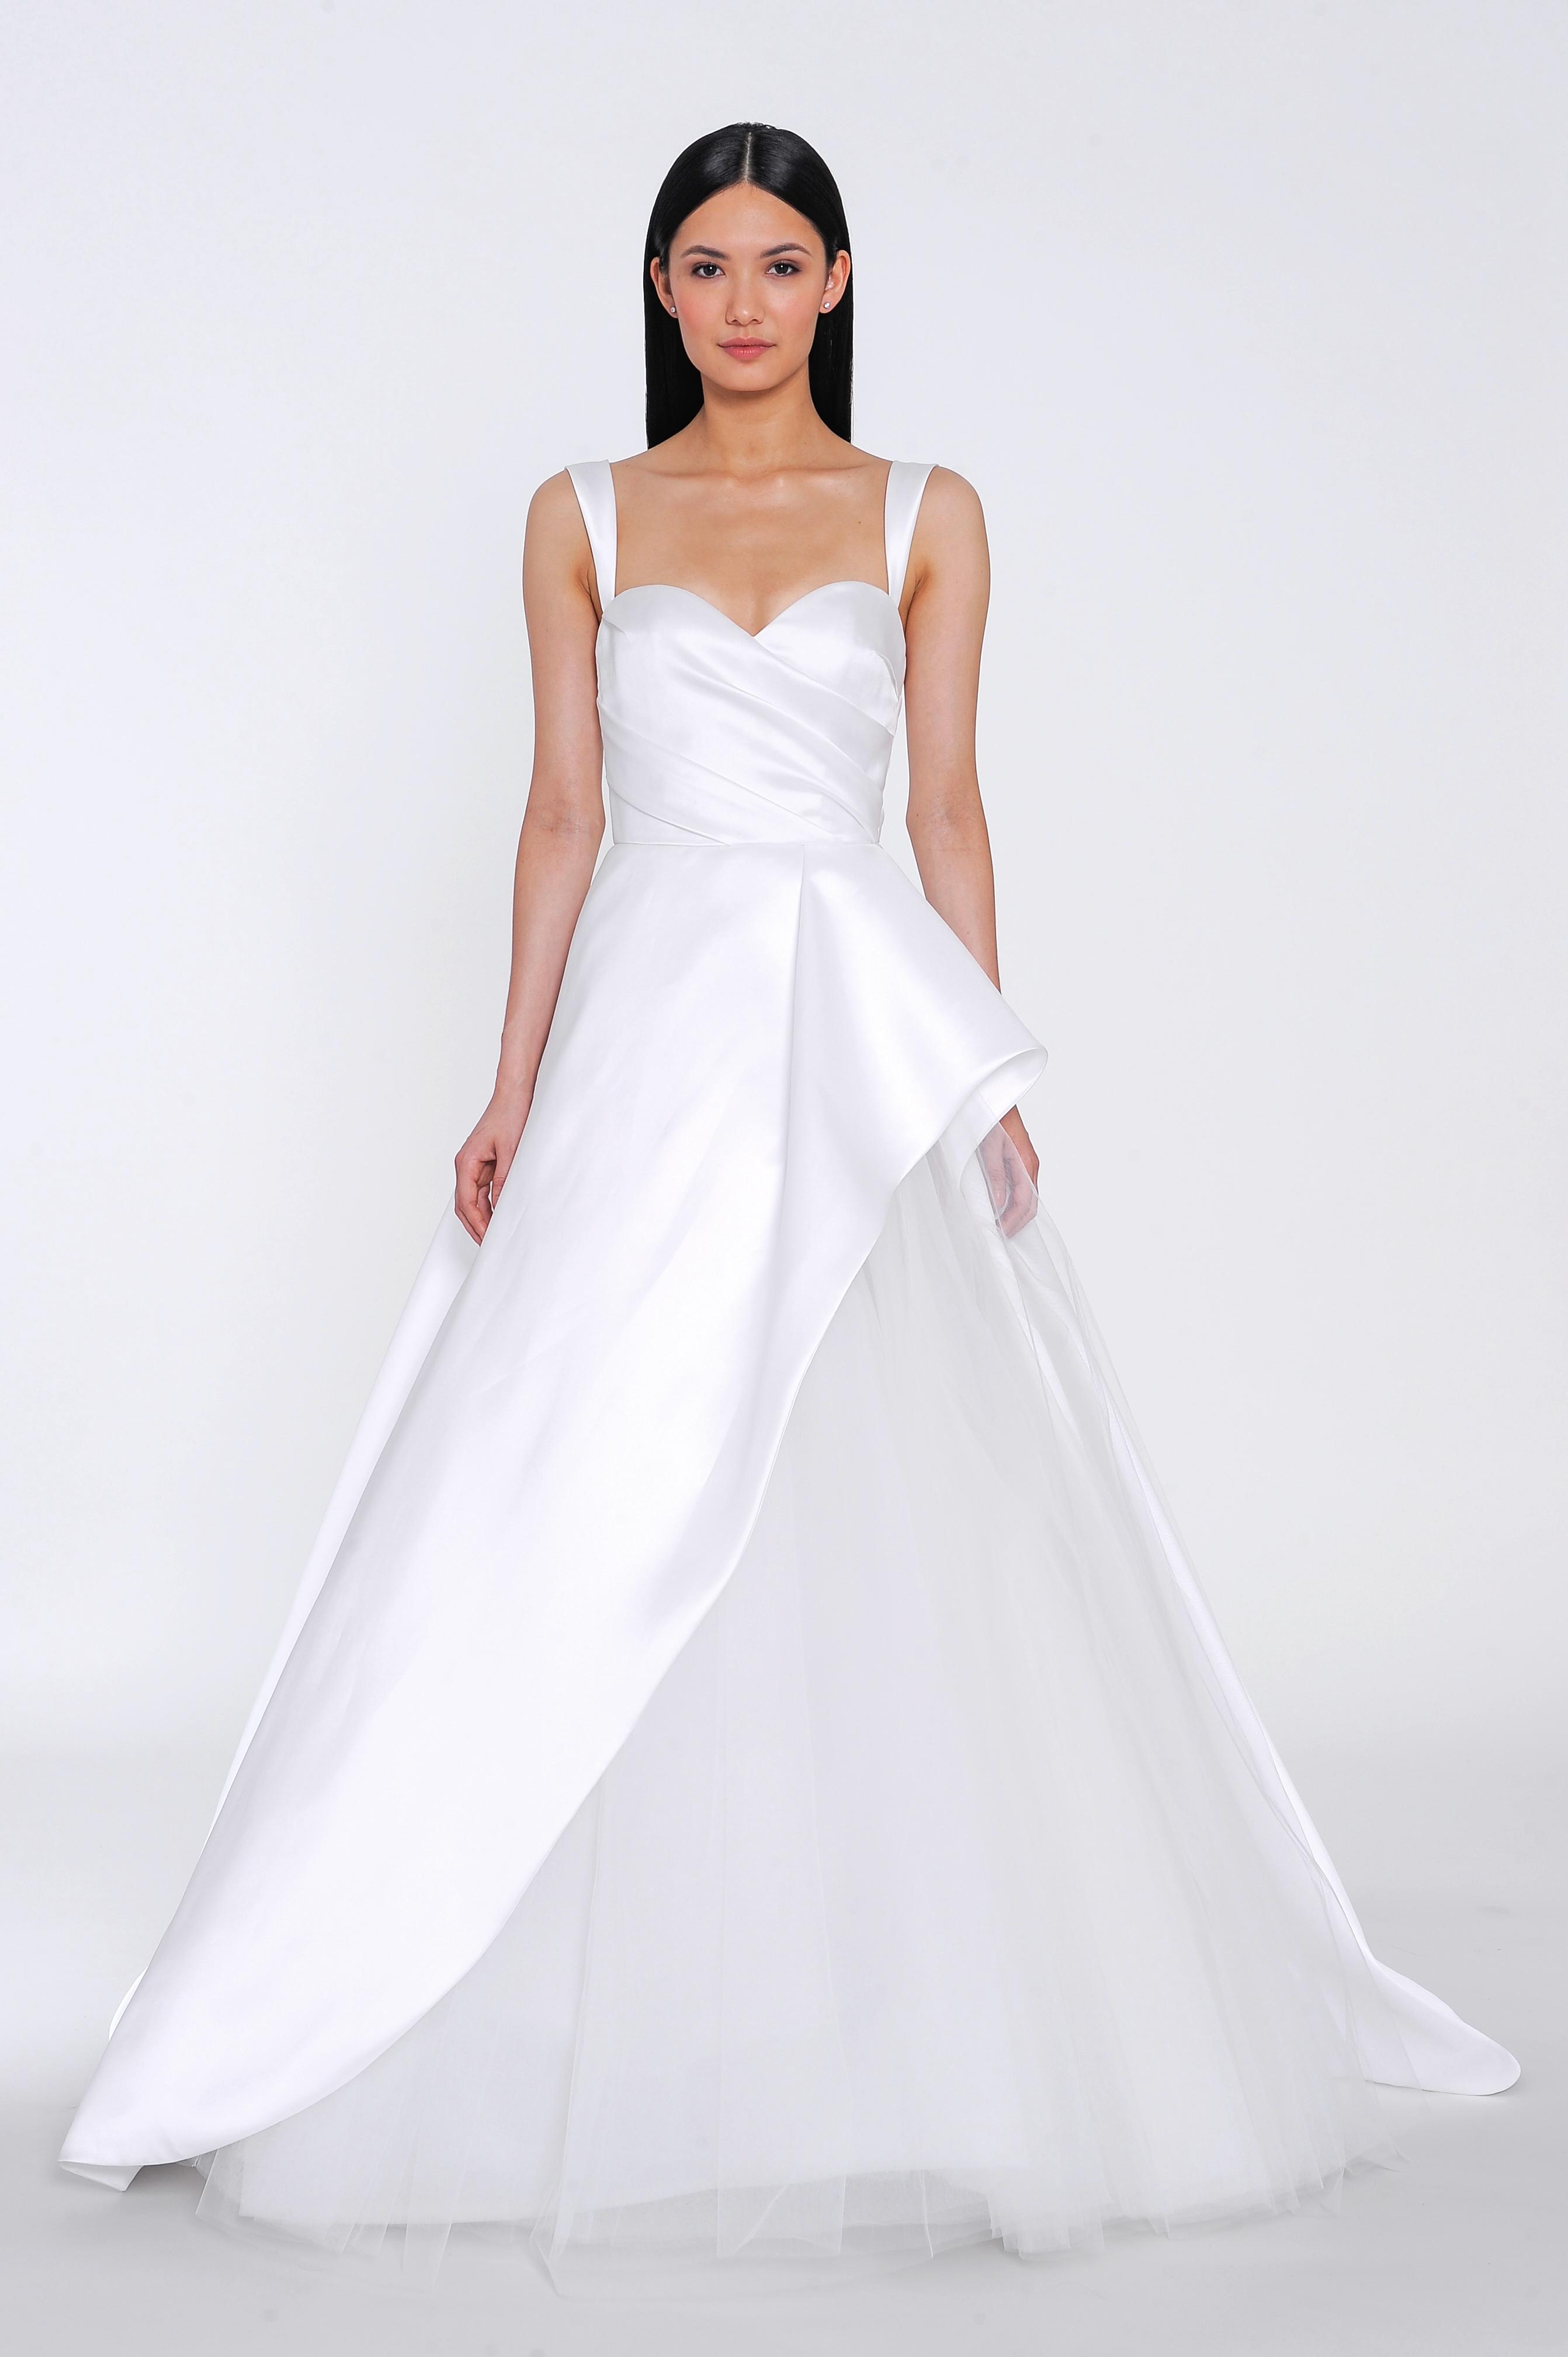 allison webb wedding dress spring 2019 sweetheart satin tulle